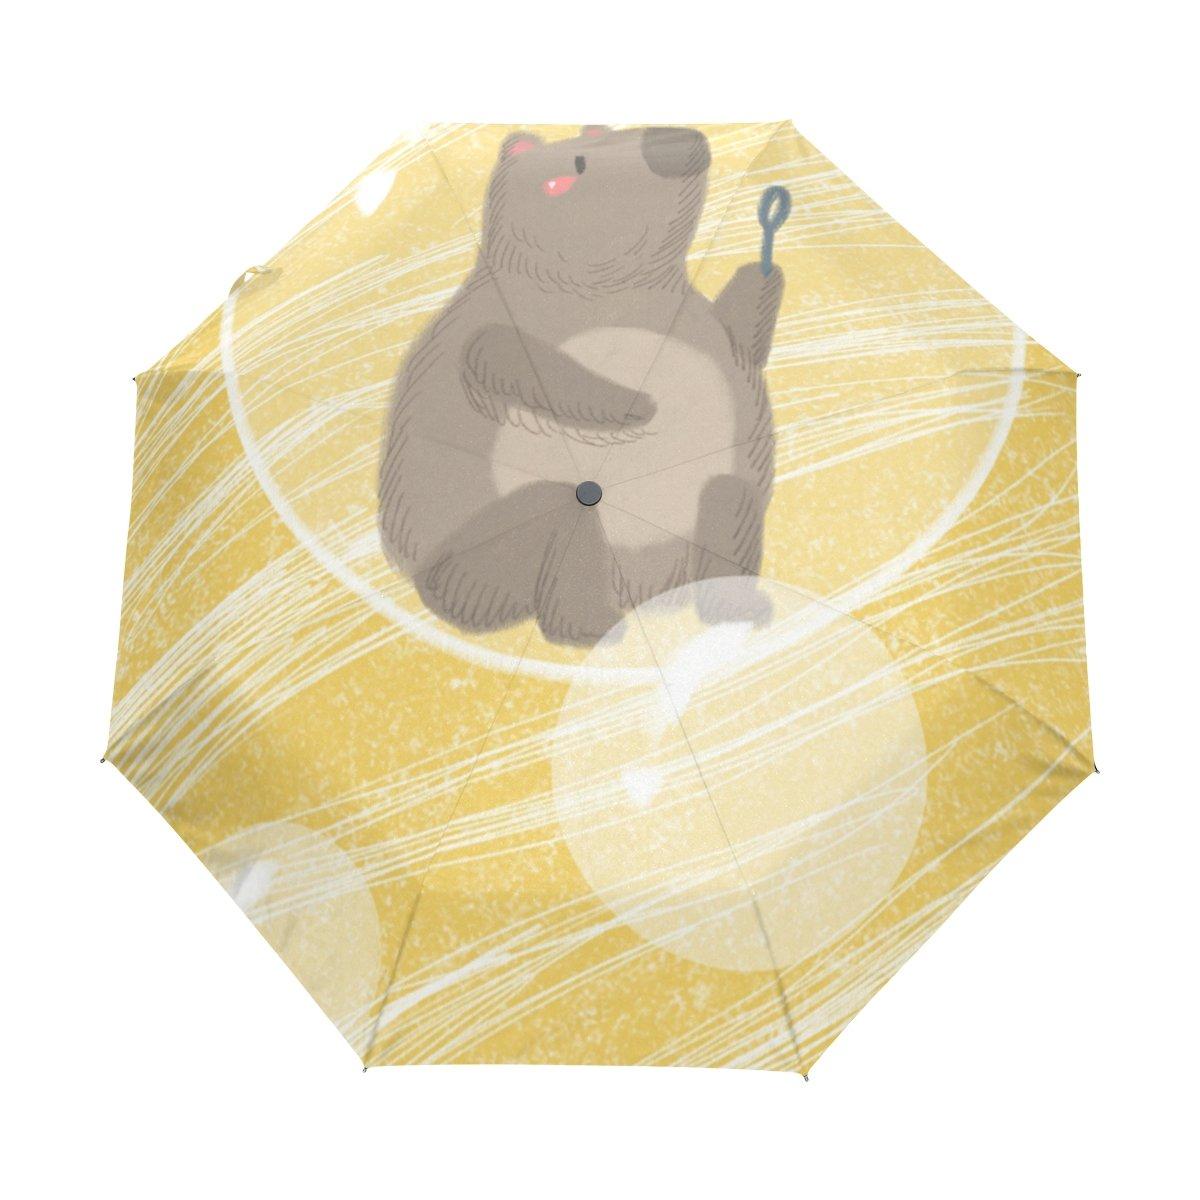 Senya Saobao防風と防雨トラベル傘with自動開いて閉じFolding Bear in the Bublesポータブル折りたたみ式太陽雨傘 B07FFSR3ZQ